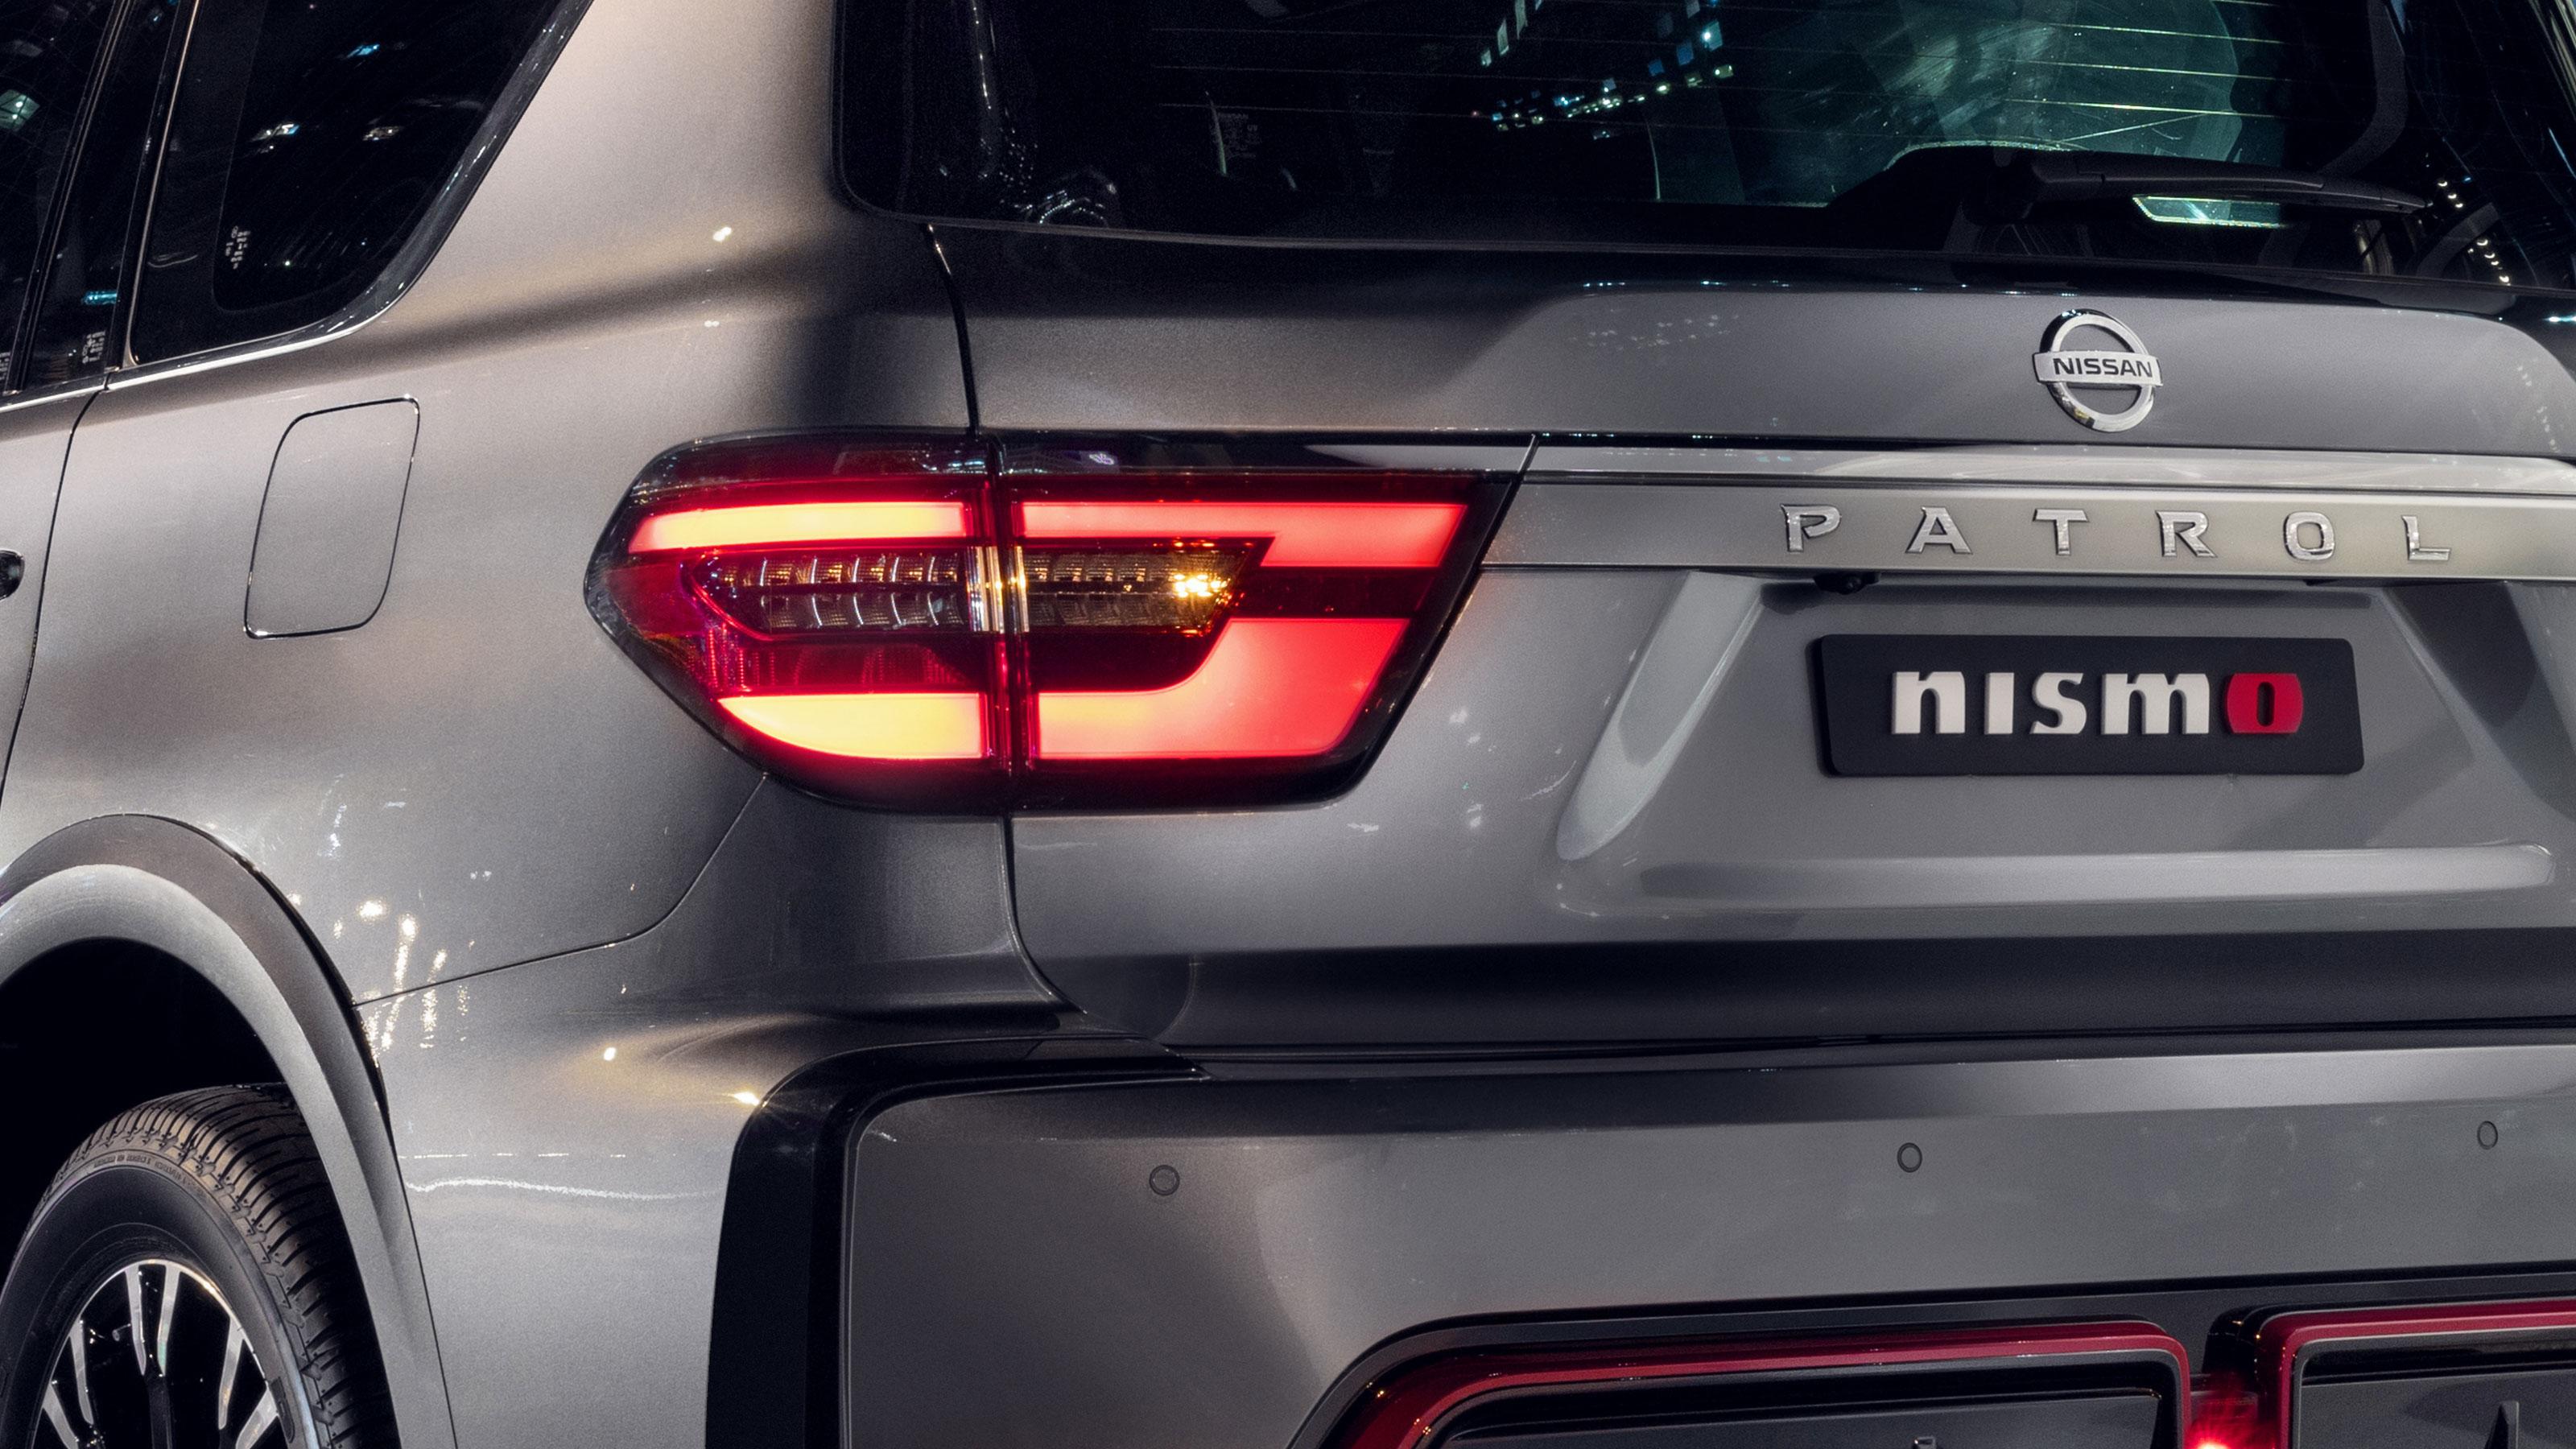 Nissan PATROL NISMO rear fog lights